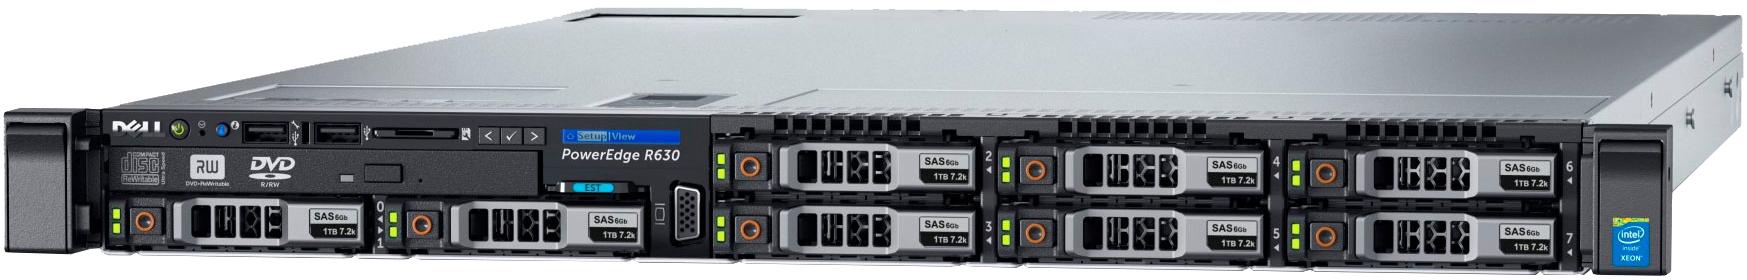 Сервер Dell PowerEdge R630 210-ACXS-151